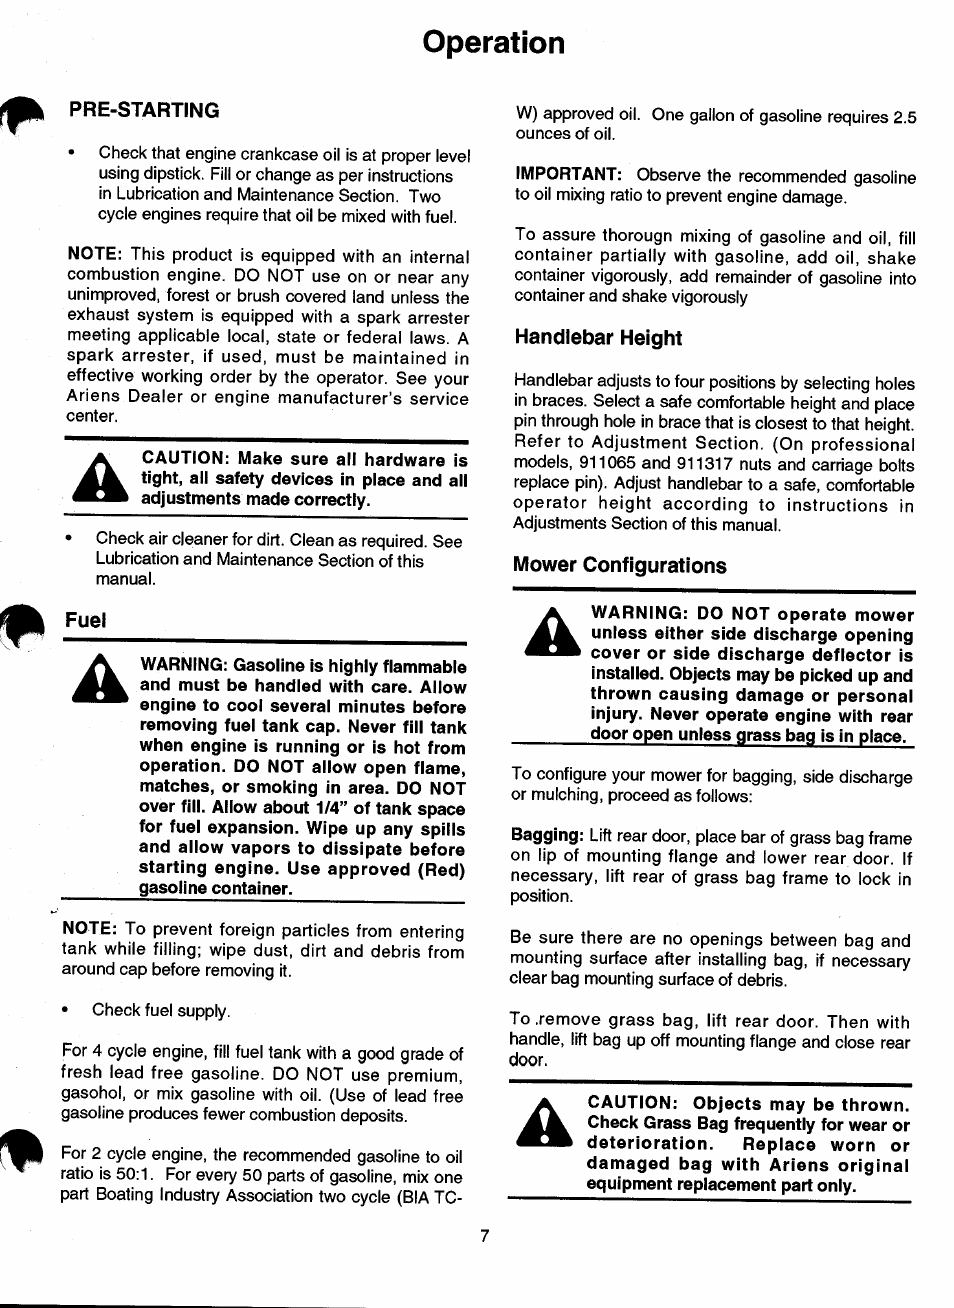 Ariens 961360006 Manual Engine Mount Diagram And Parts List For Murray Walkbehindlawnmower Array Free Rh Futuri Us